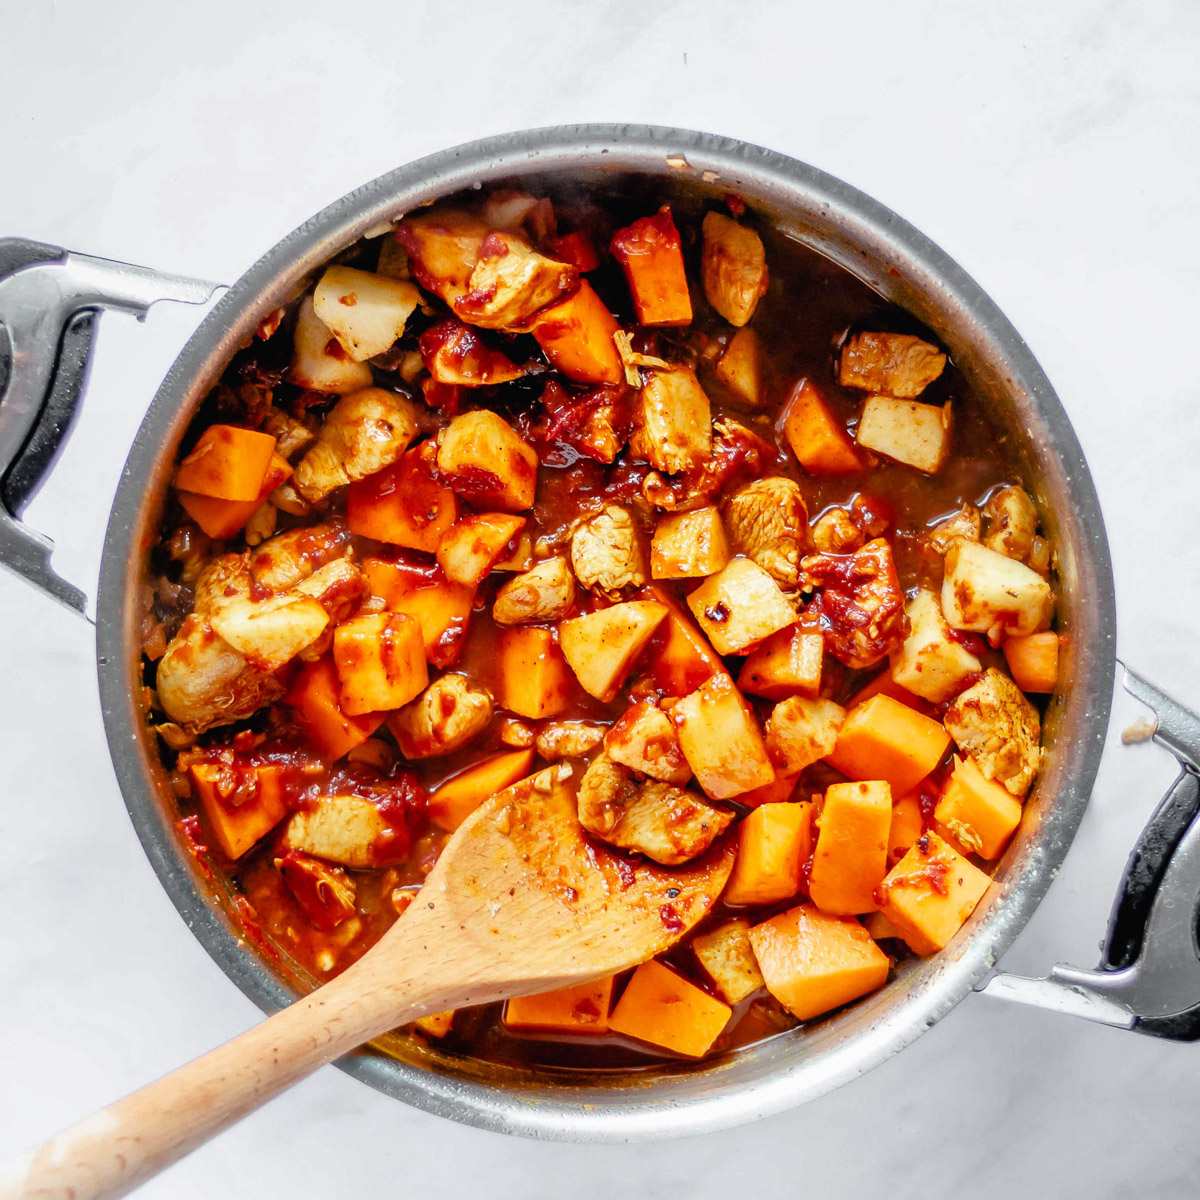 a spoon stirring pumpkin stew in a pot